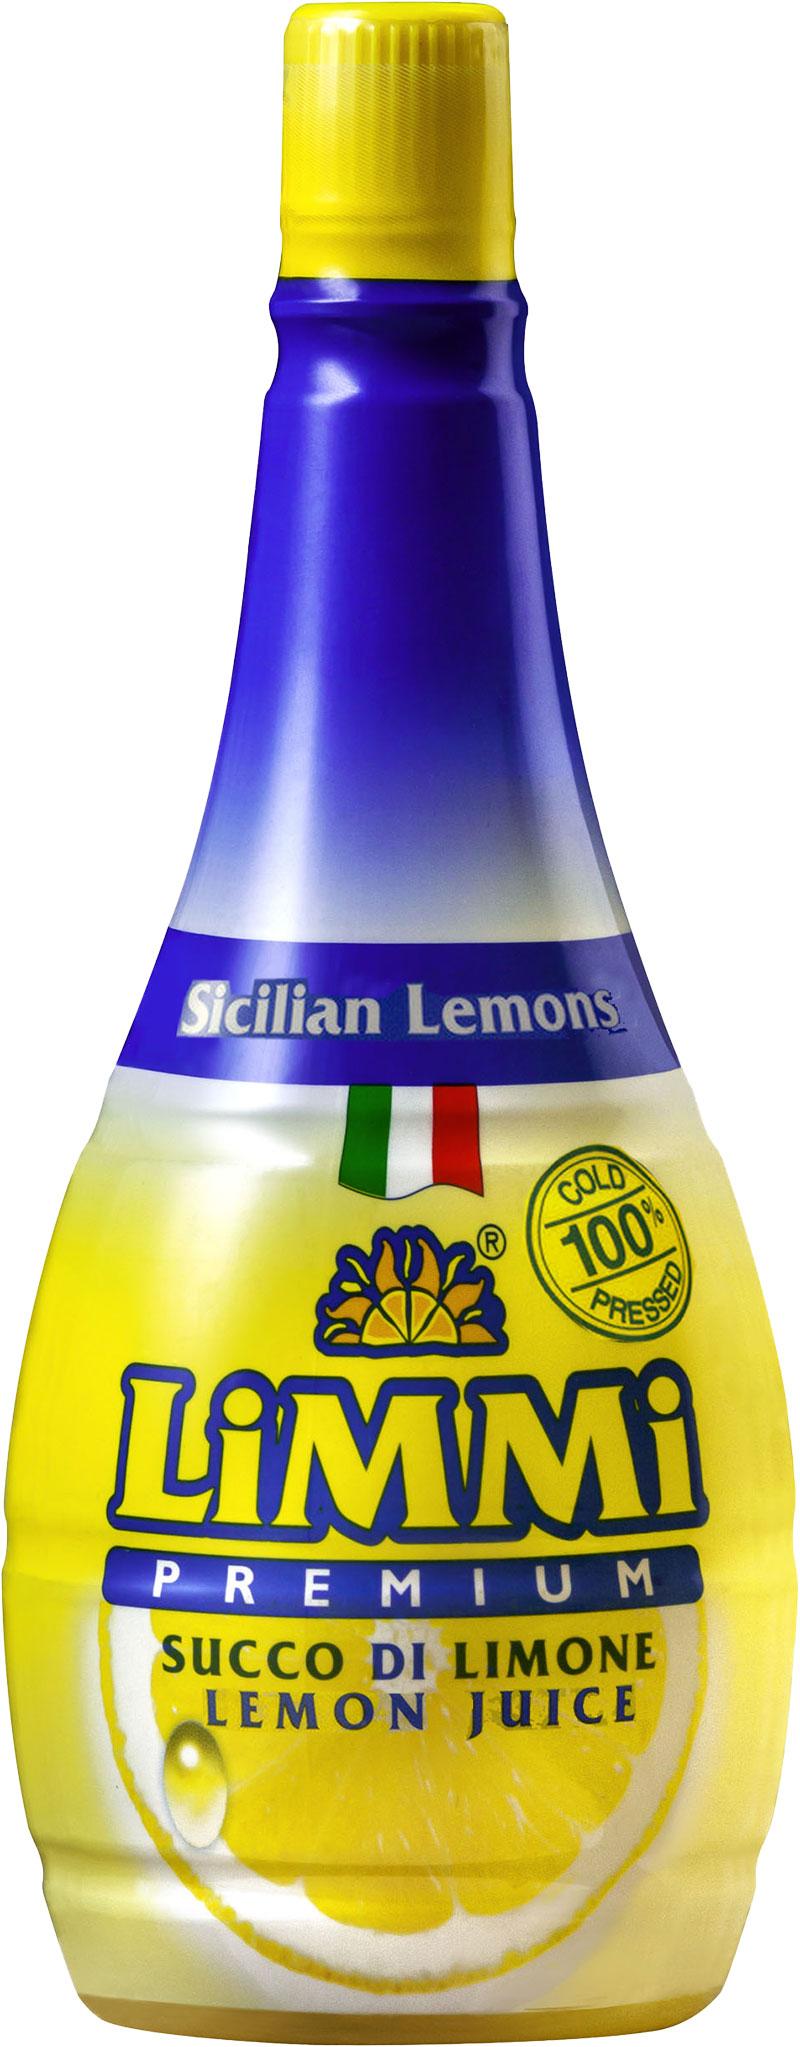 The Limmi Premium lemon juice bottle